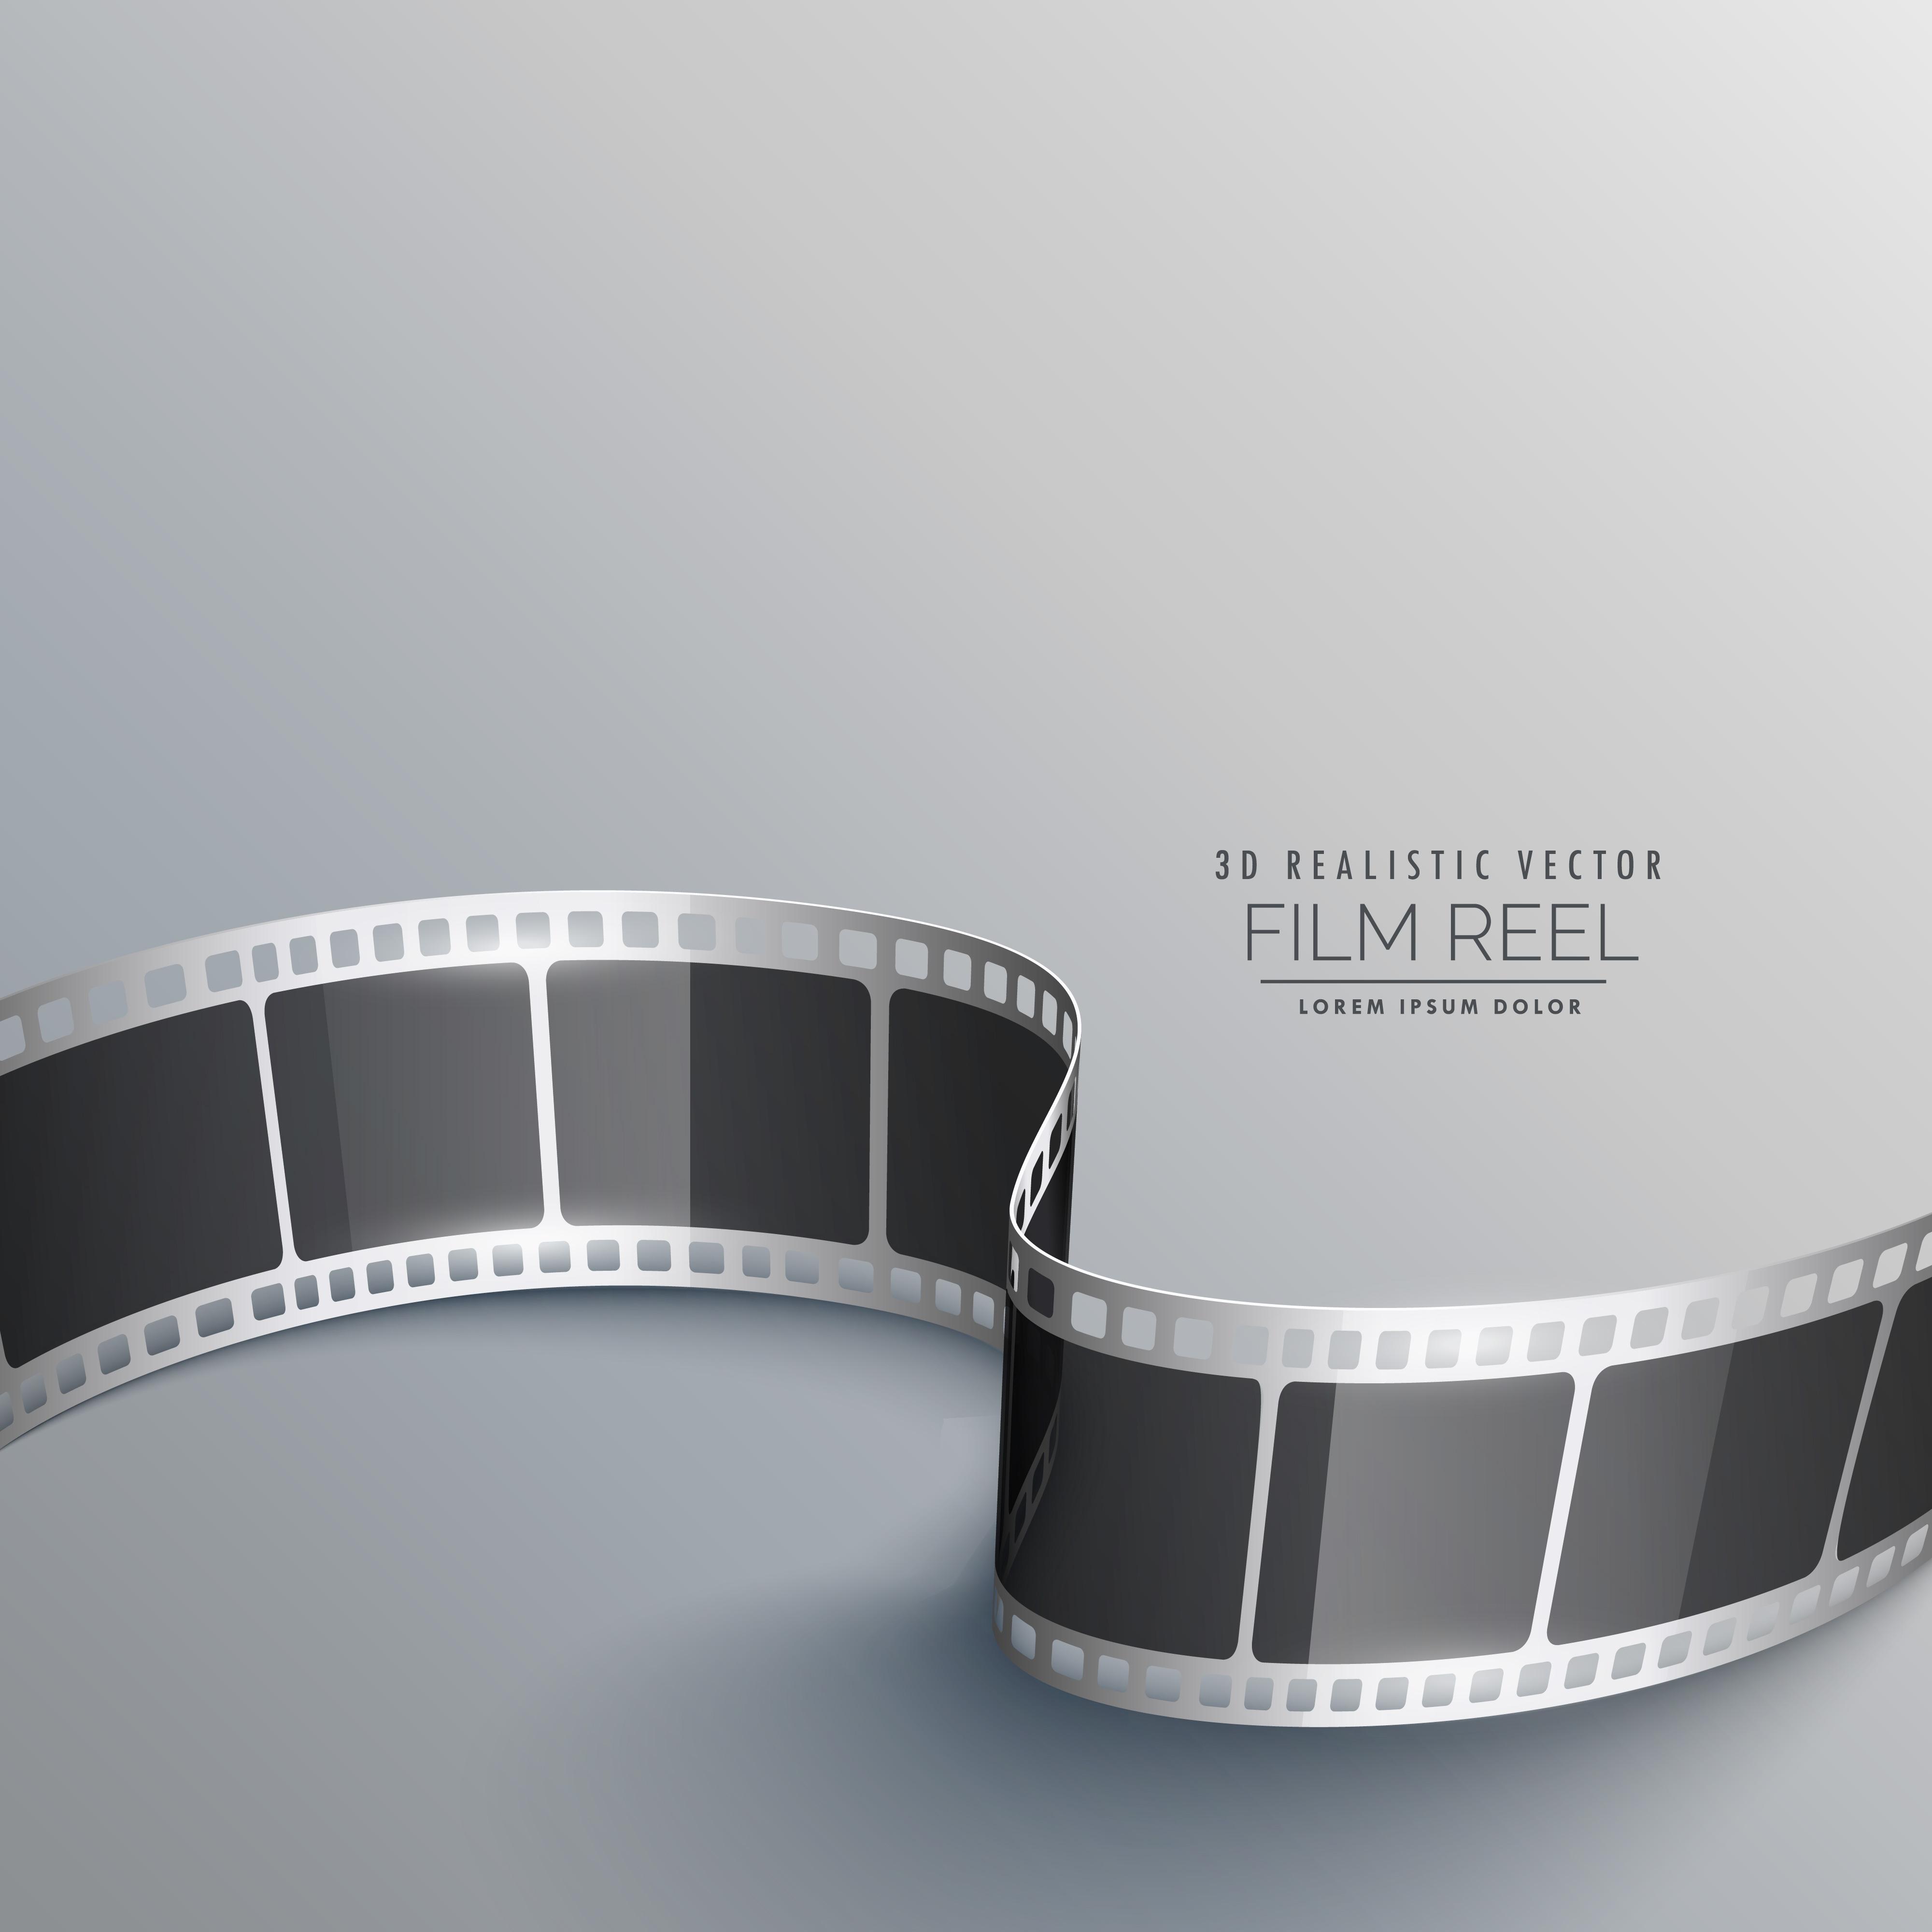 cinema background with 3d film strip - Download Free ...